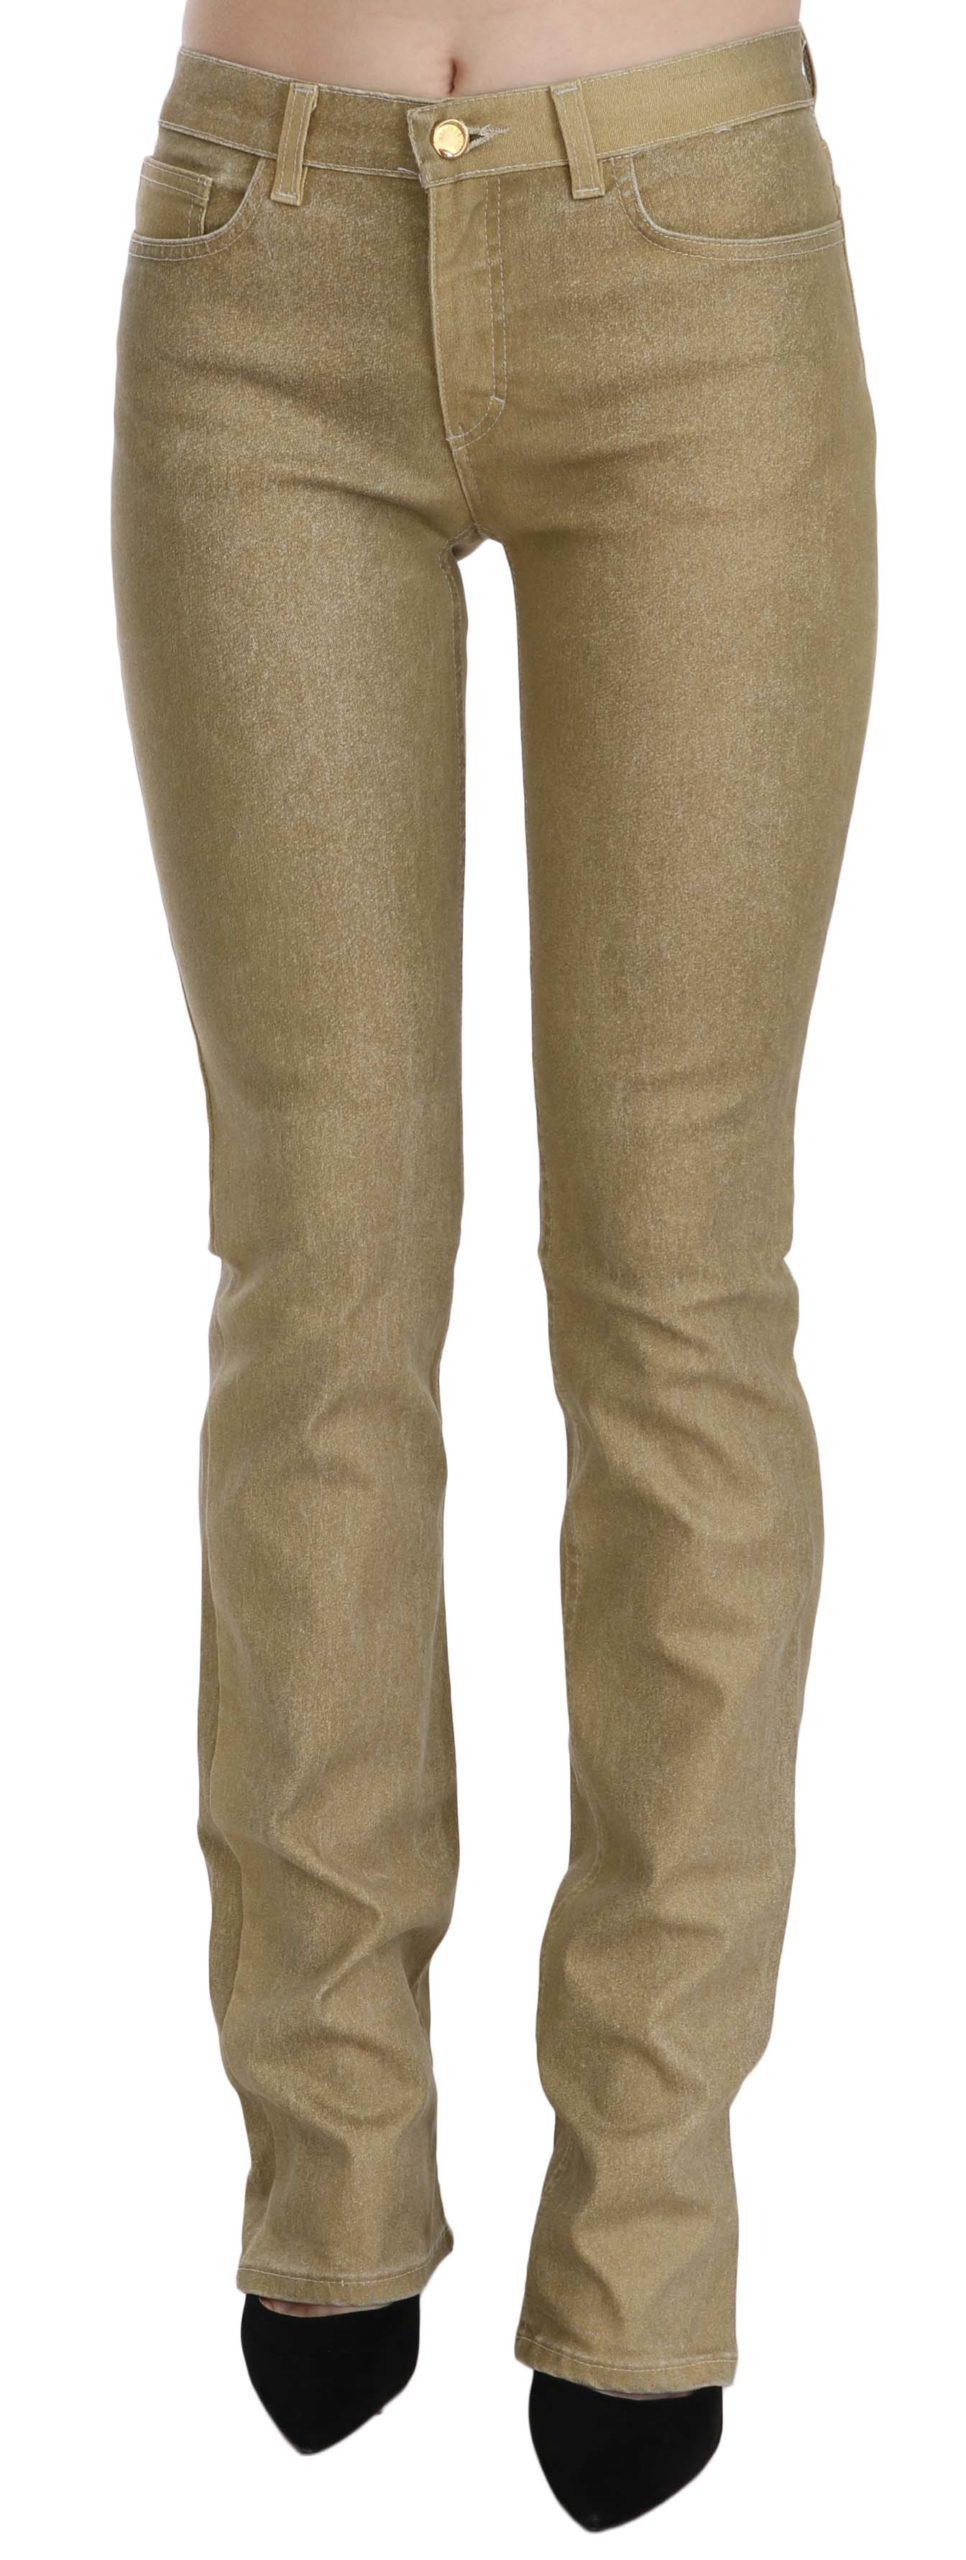 Cavalli Women's Mid Waist Skinny Denim Trouser Brown PAN70348 - IT40|S